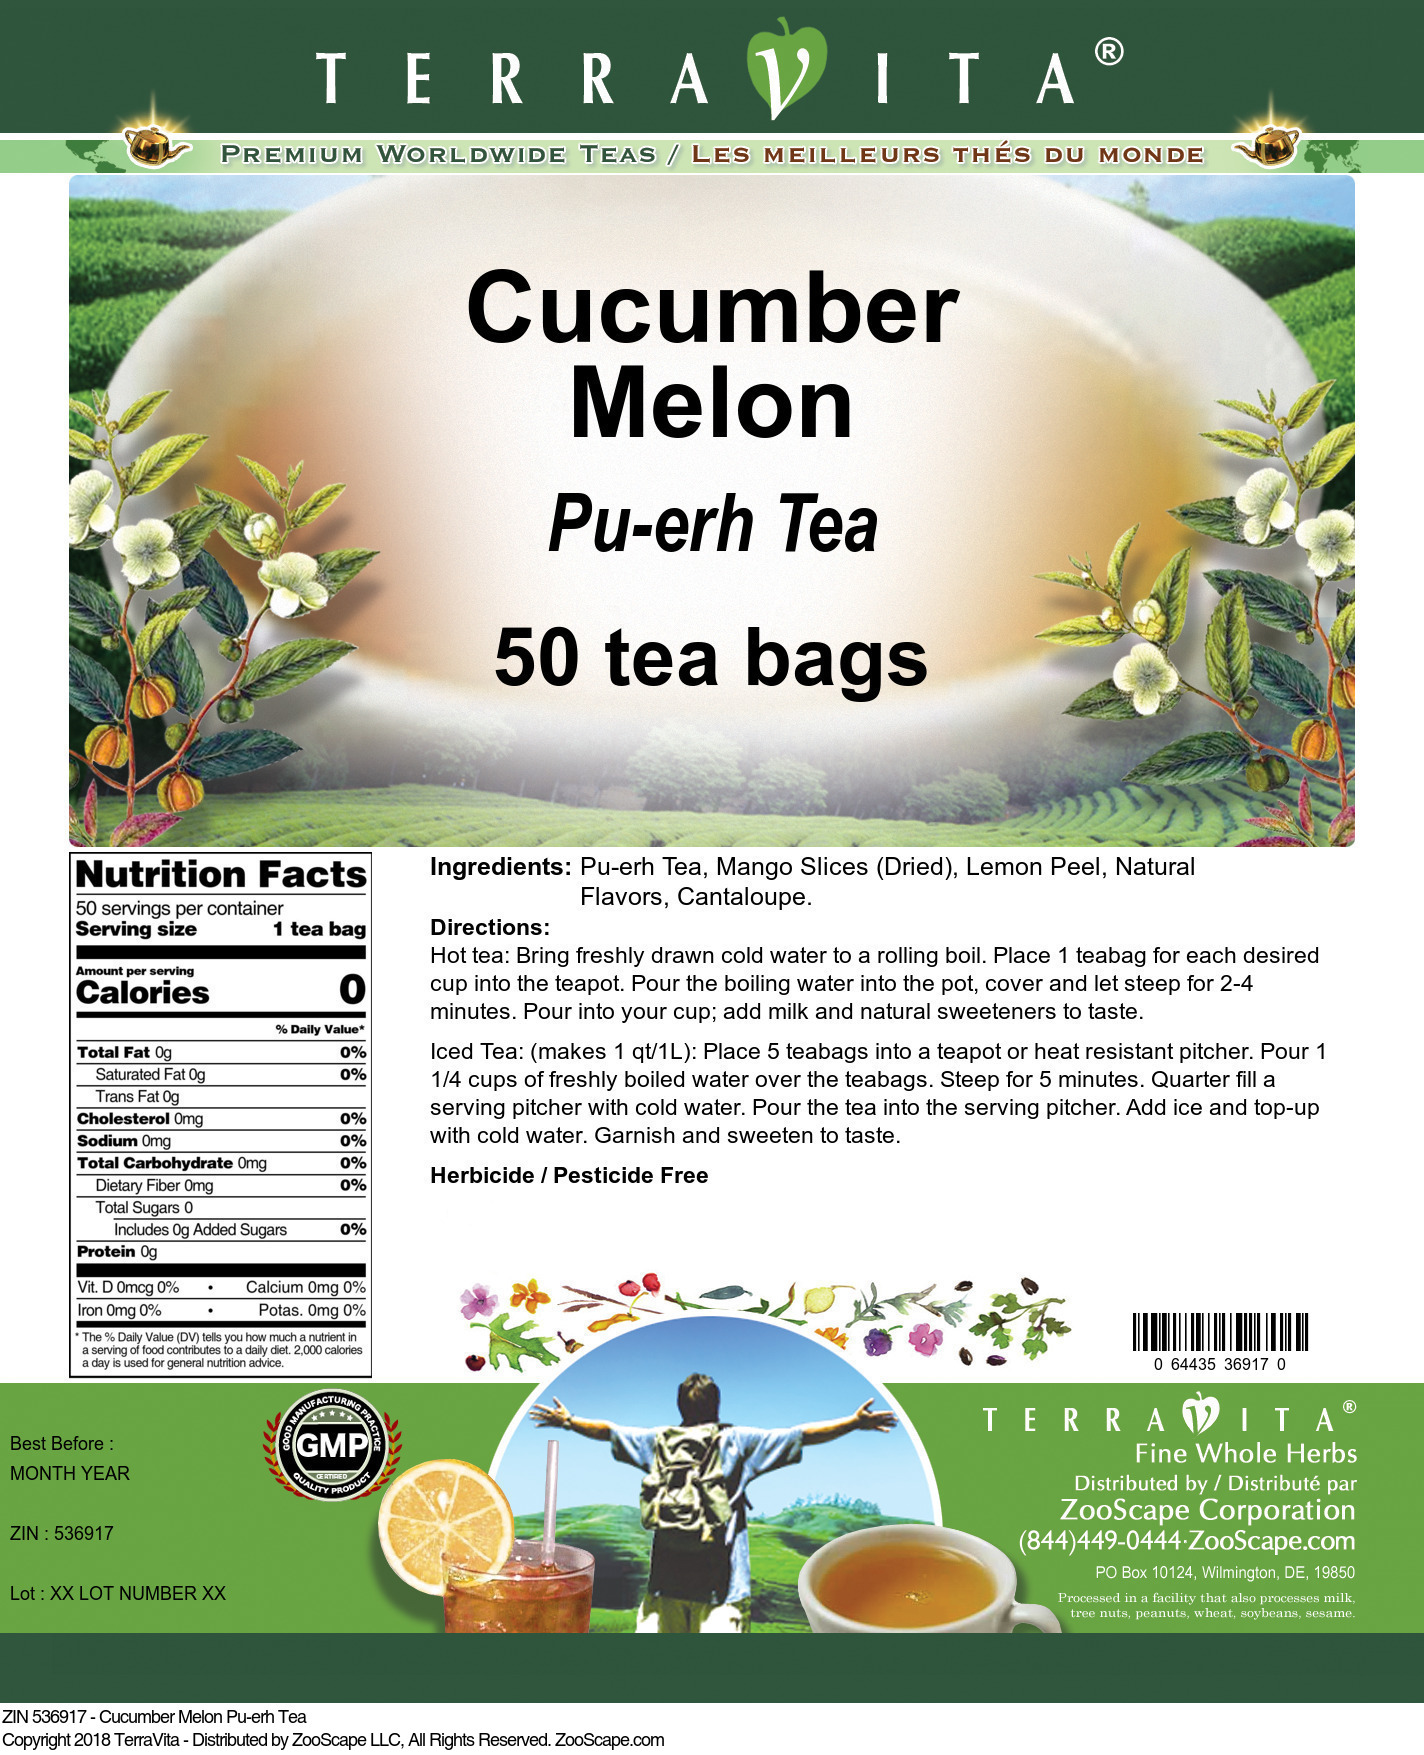 Cucumber Melon Pu-erh Tea